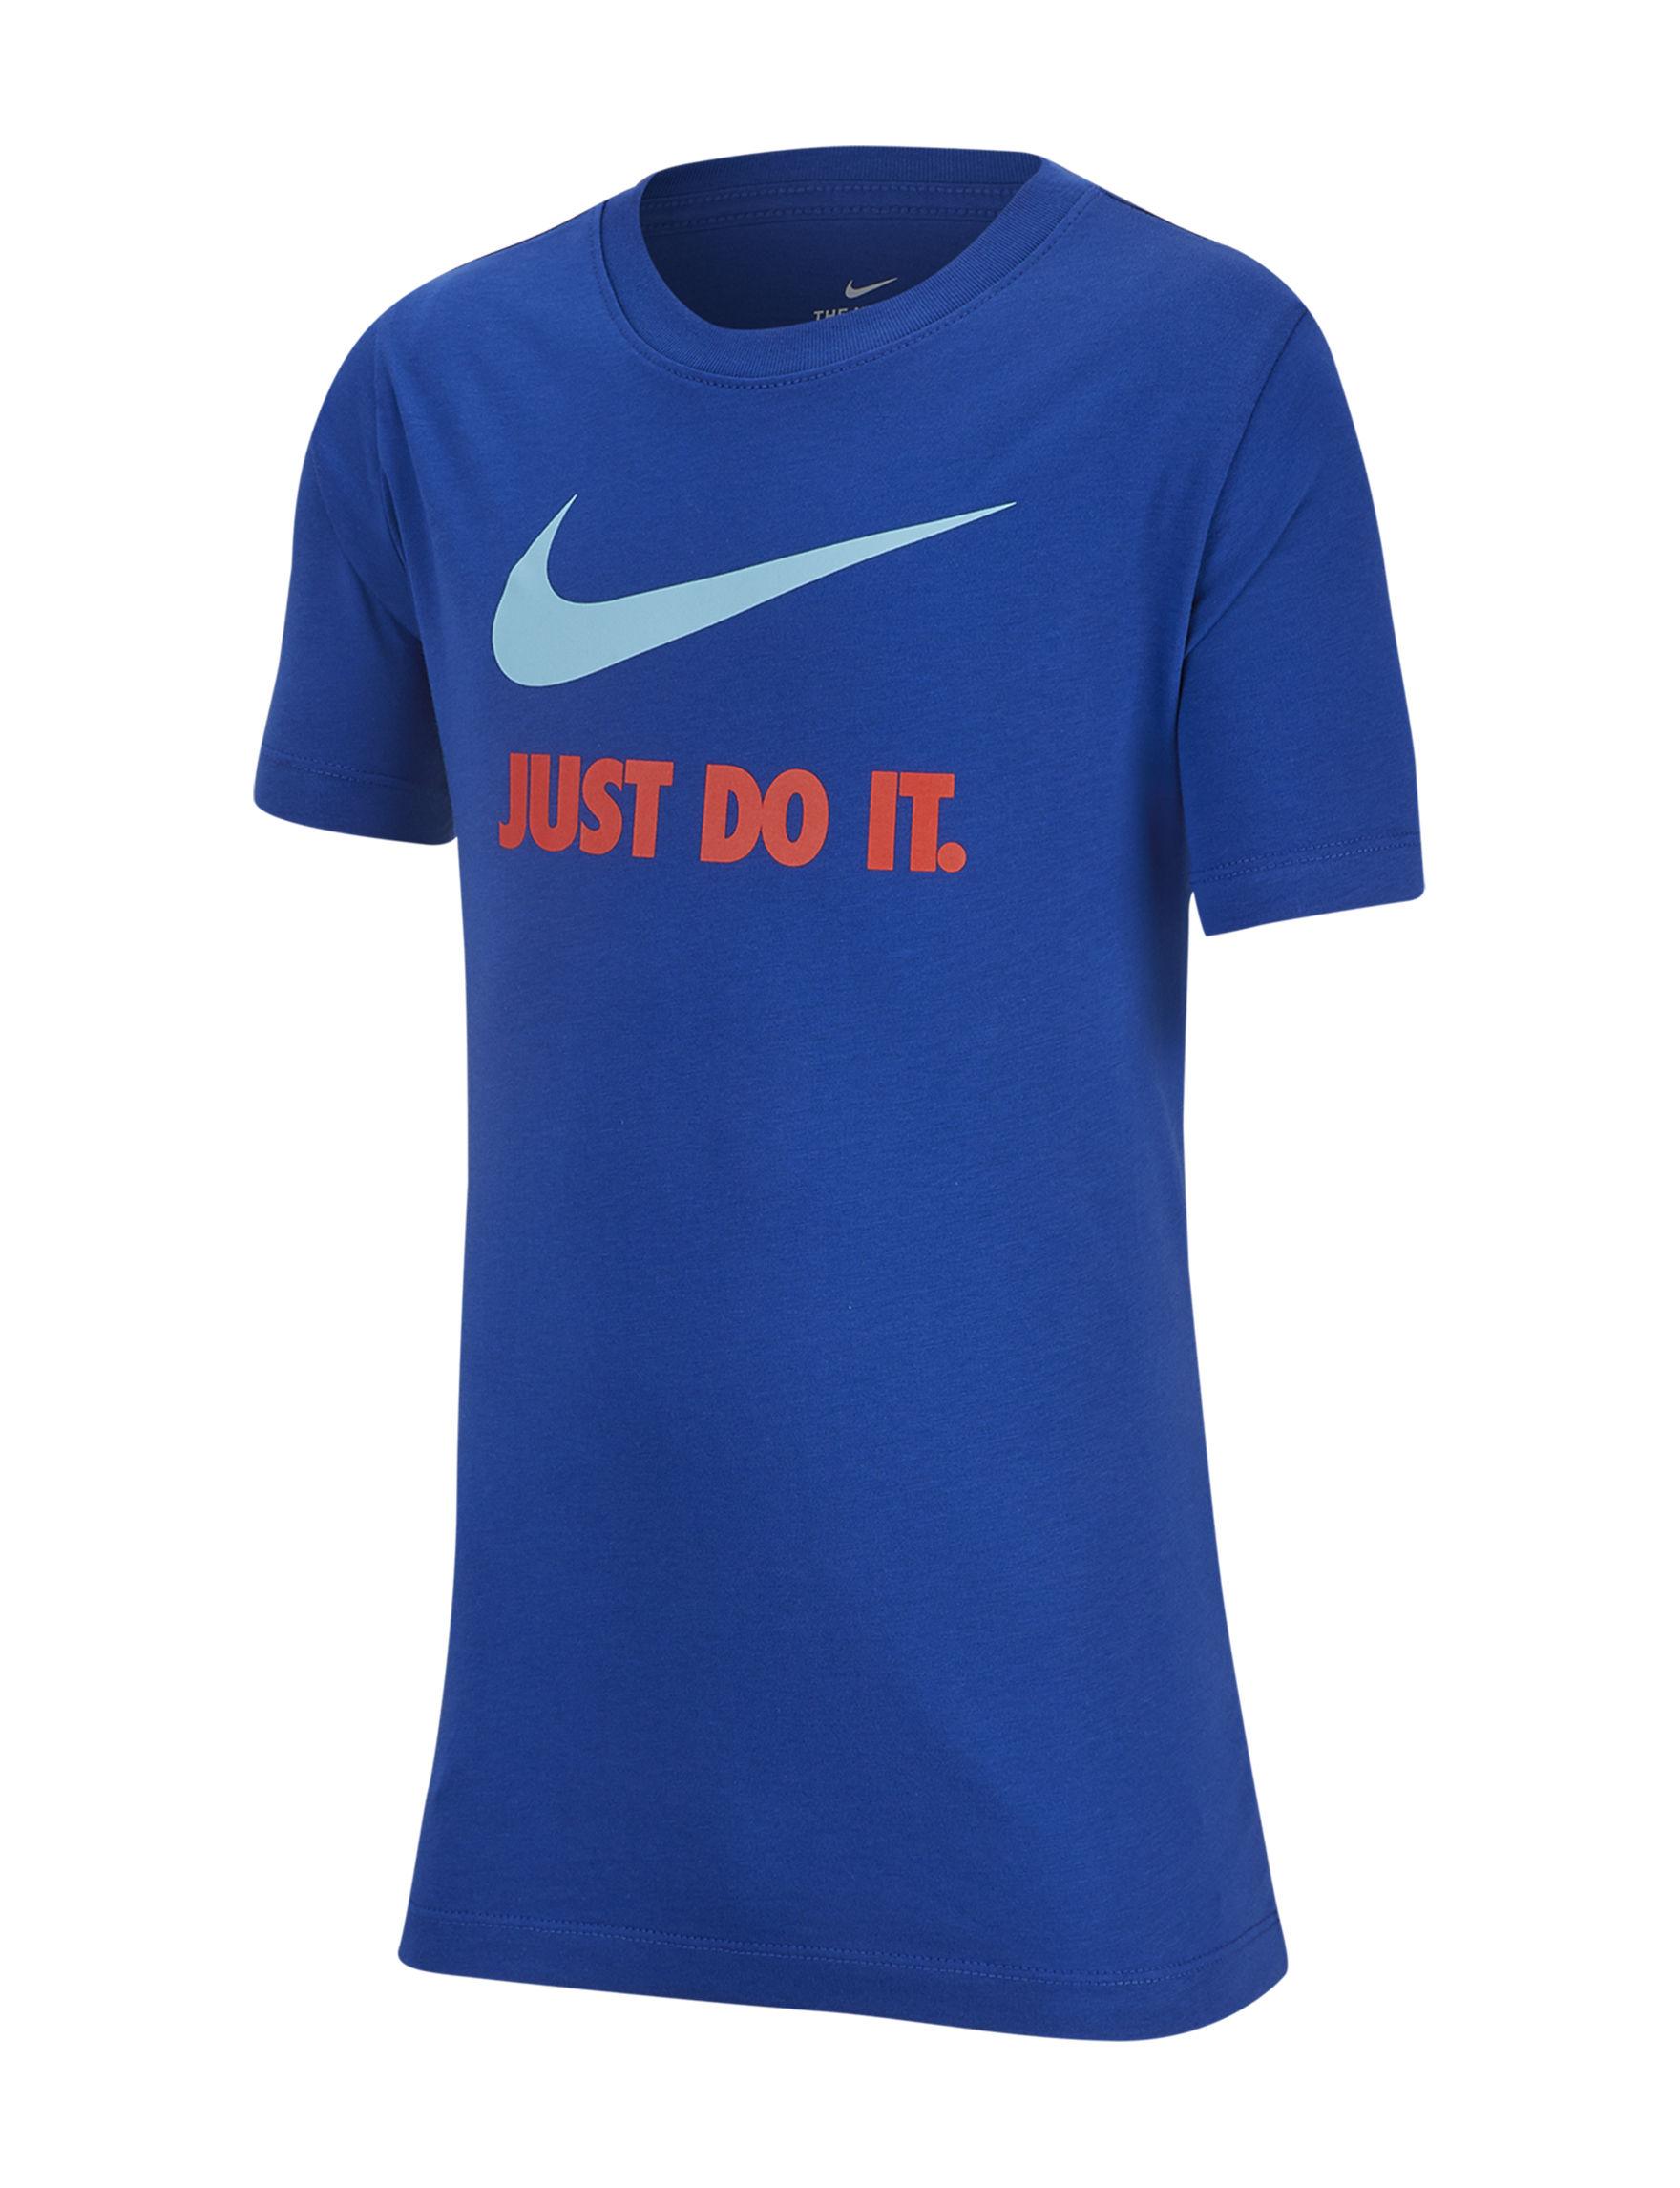 Nike Royal Blue Tees & Tanks